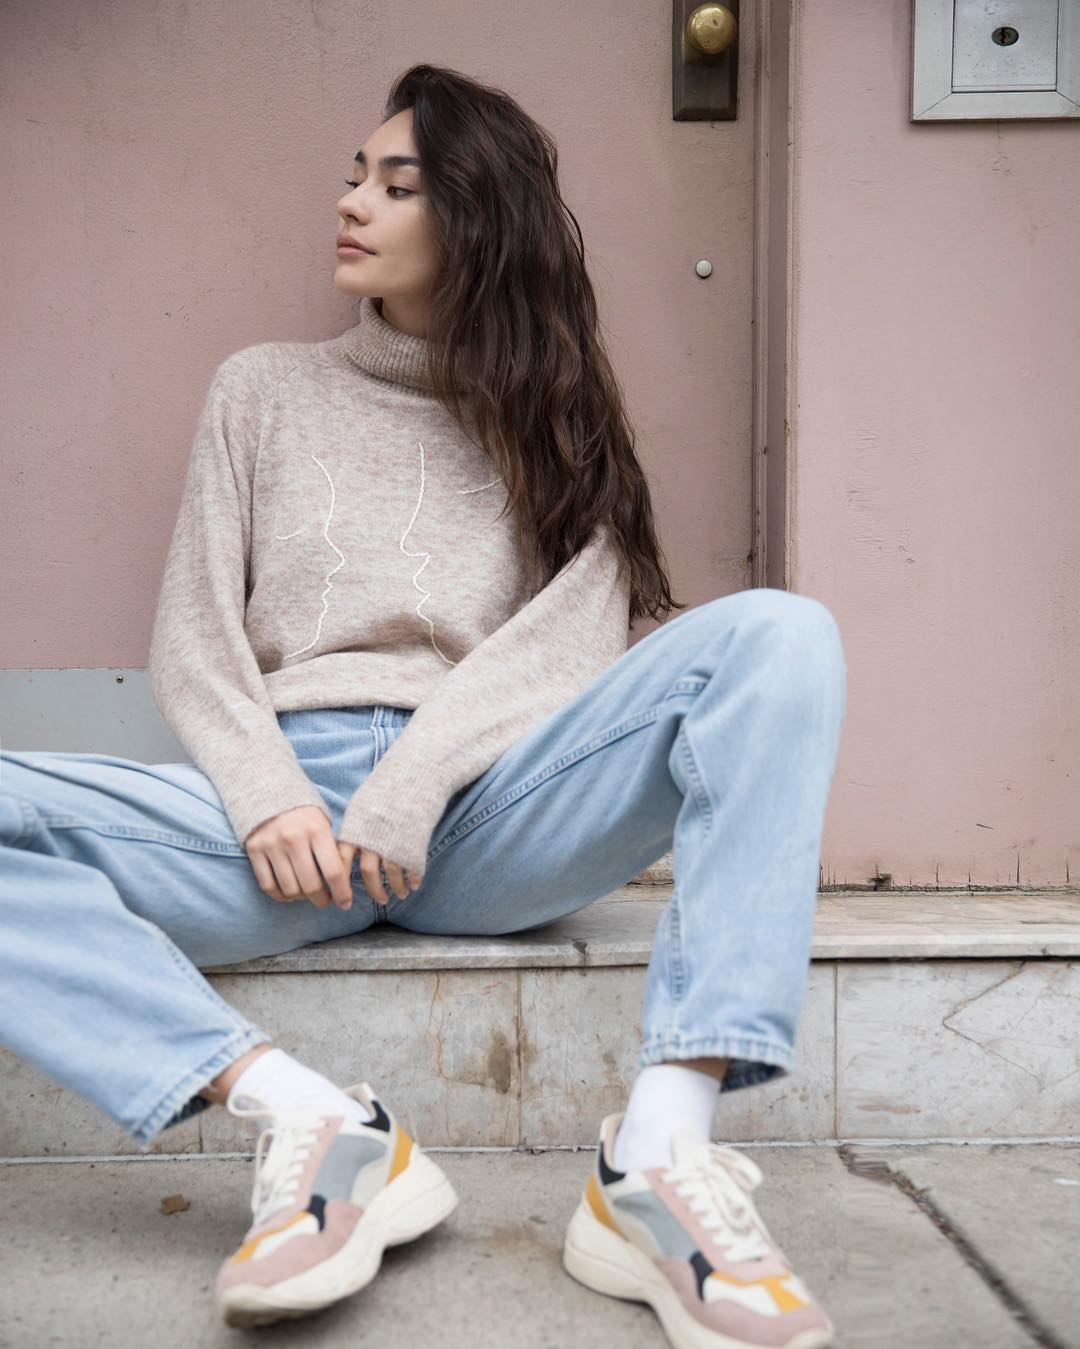 Kaitlyn-Fitzpatrick-Wallpapers-Insta-Fit-Bio-2